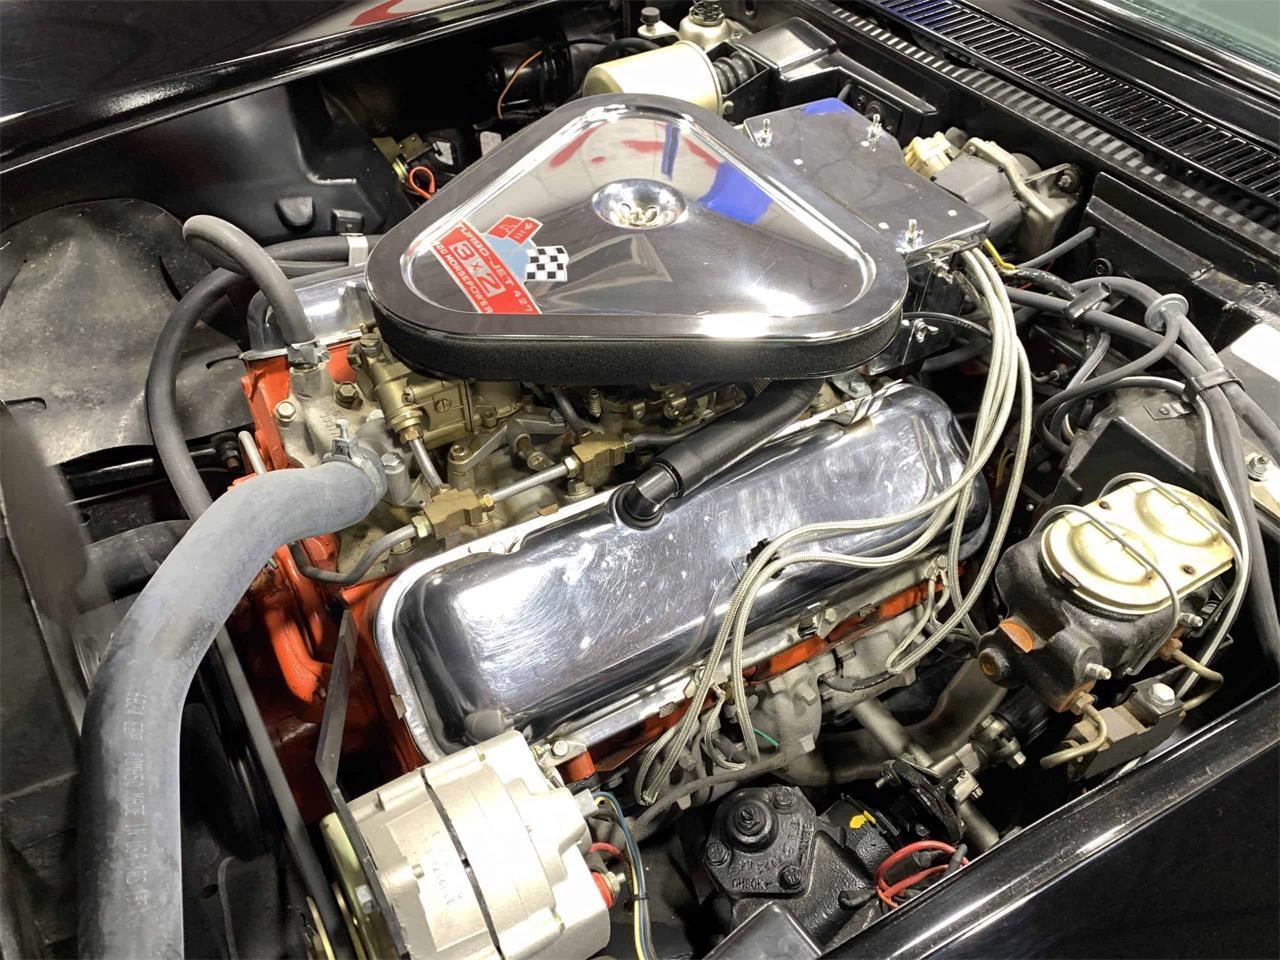 1968 Chevrolet Corvette (CC-1383019) for sale in Pittsburgh, Pennsylvania